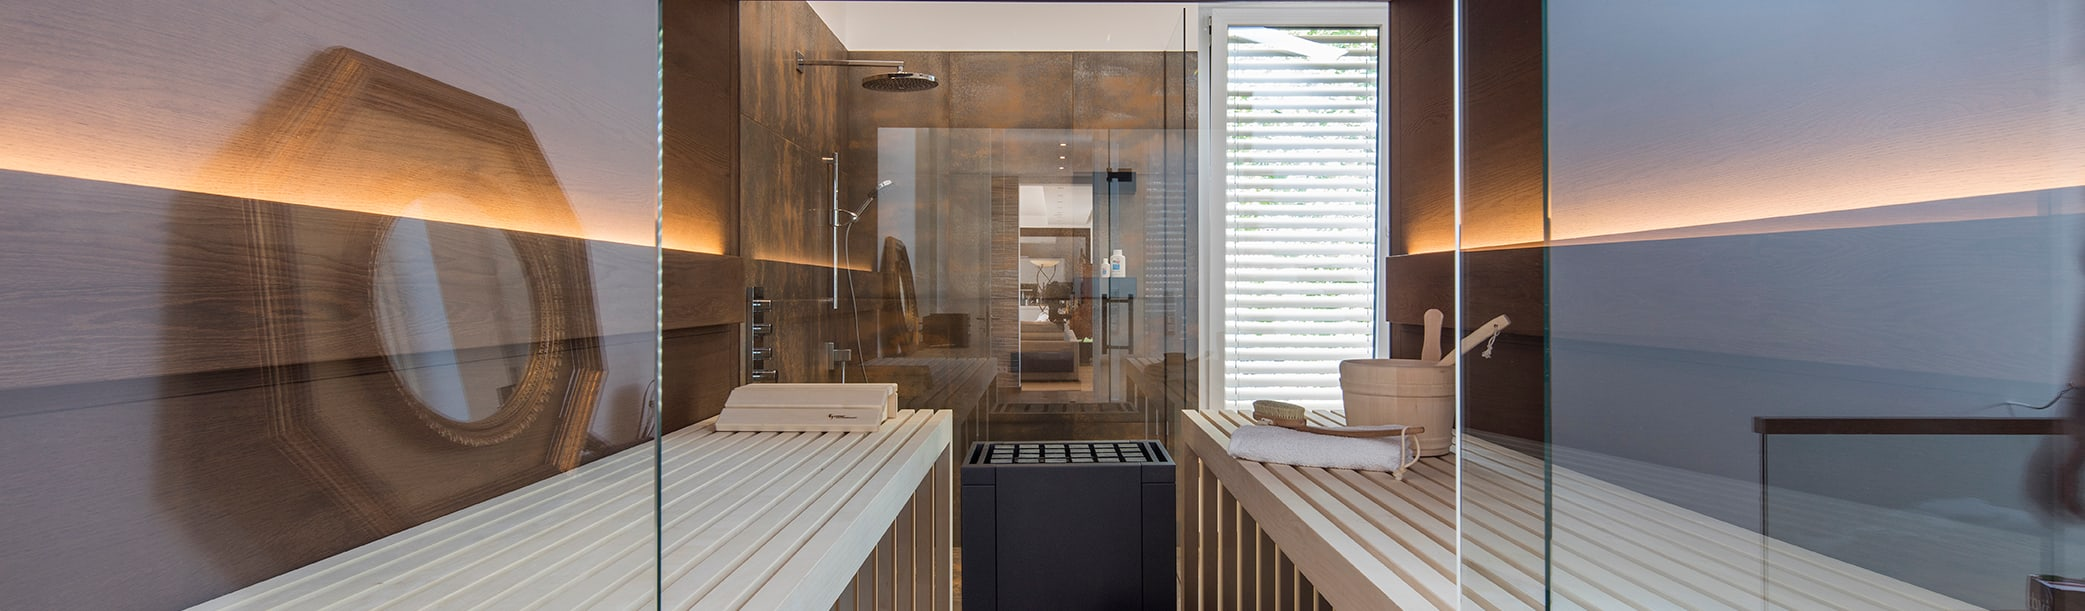 corso sauna manufaktur gmbh